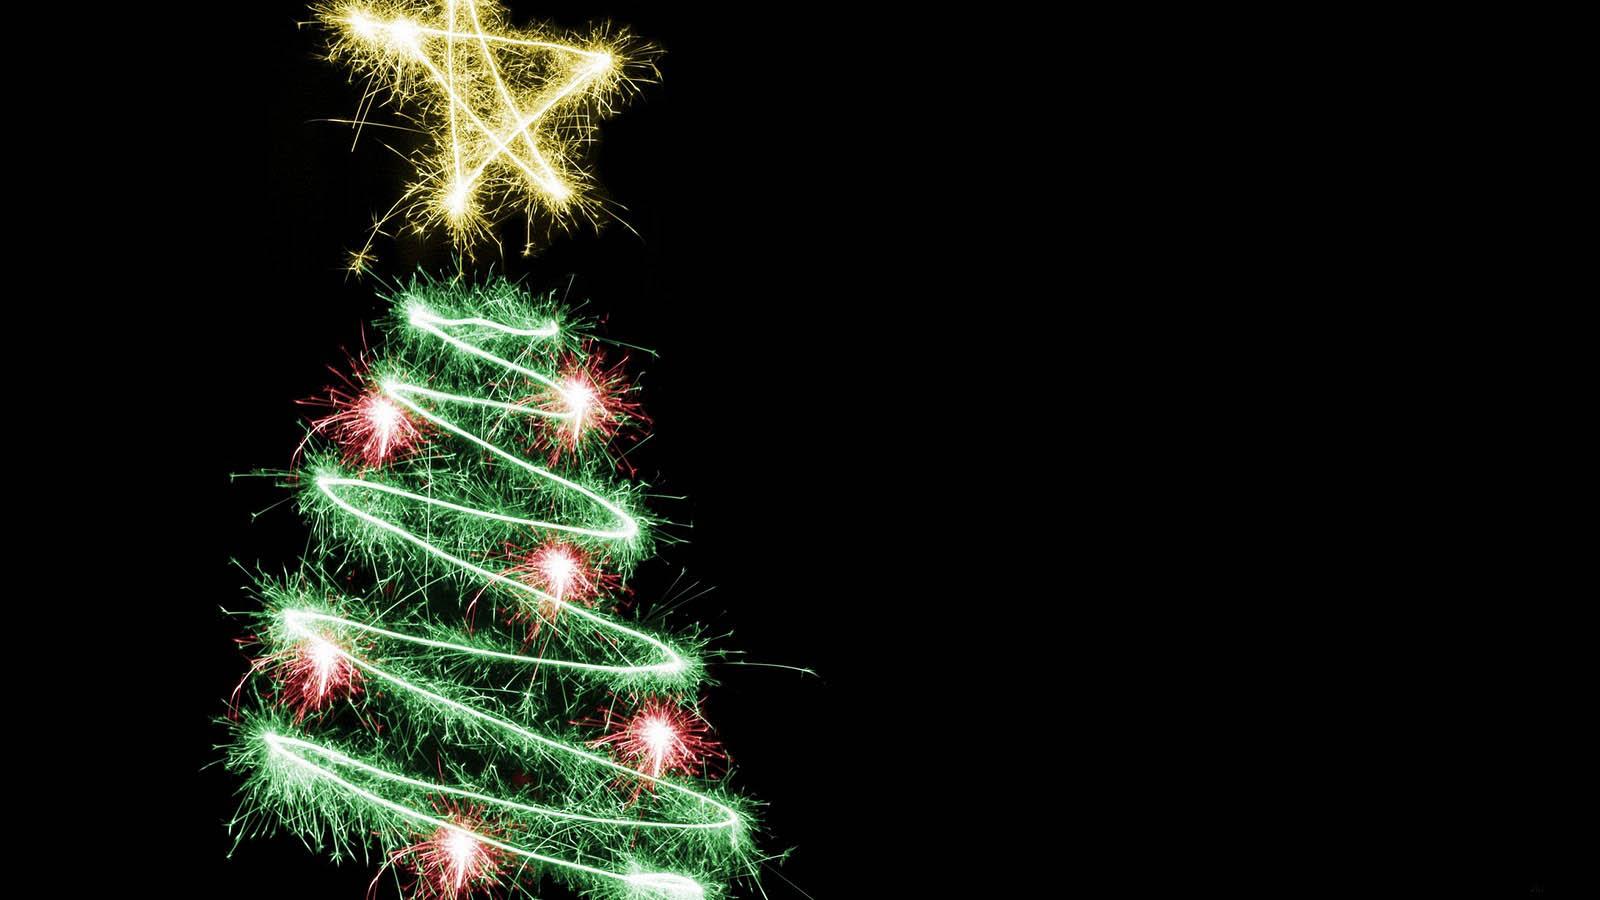 Free Download Best Desktop Hd Wallpaper Christmas Lights